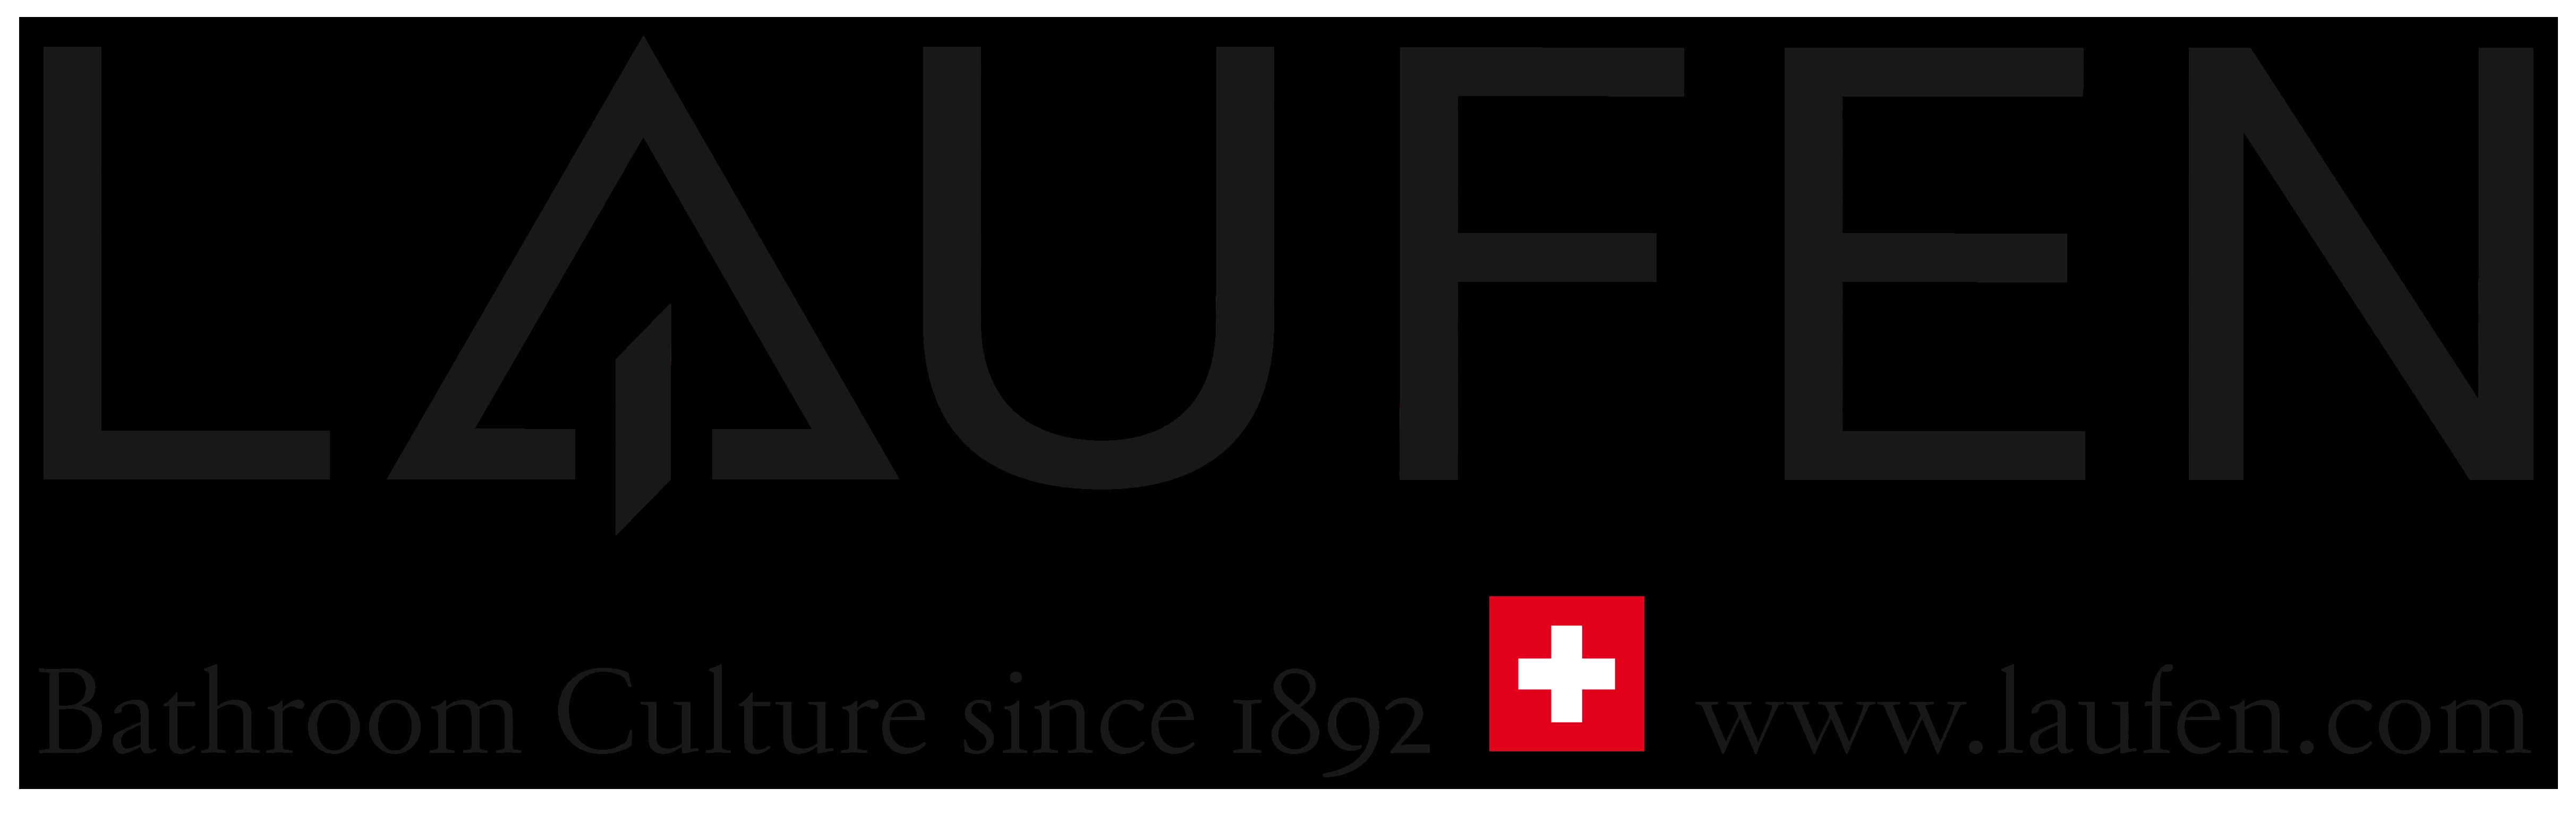 Imagini pentru laufen logo